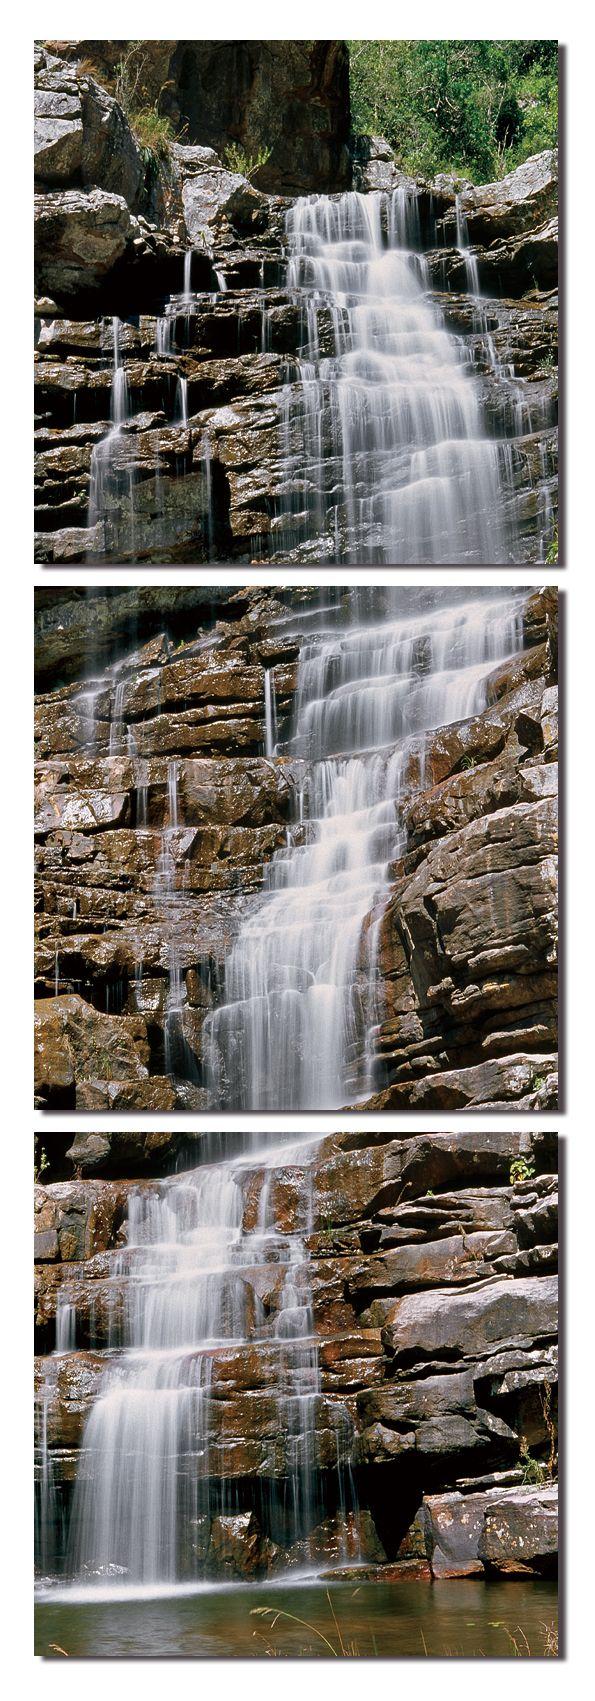 Waterfall http://mytriptychart.com | Triptych | Pinterest | Waterfalls - Waterfall http://mytriptychart.com. Bathroom ArtWaterfall